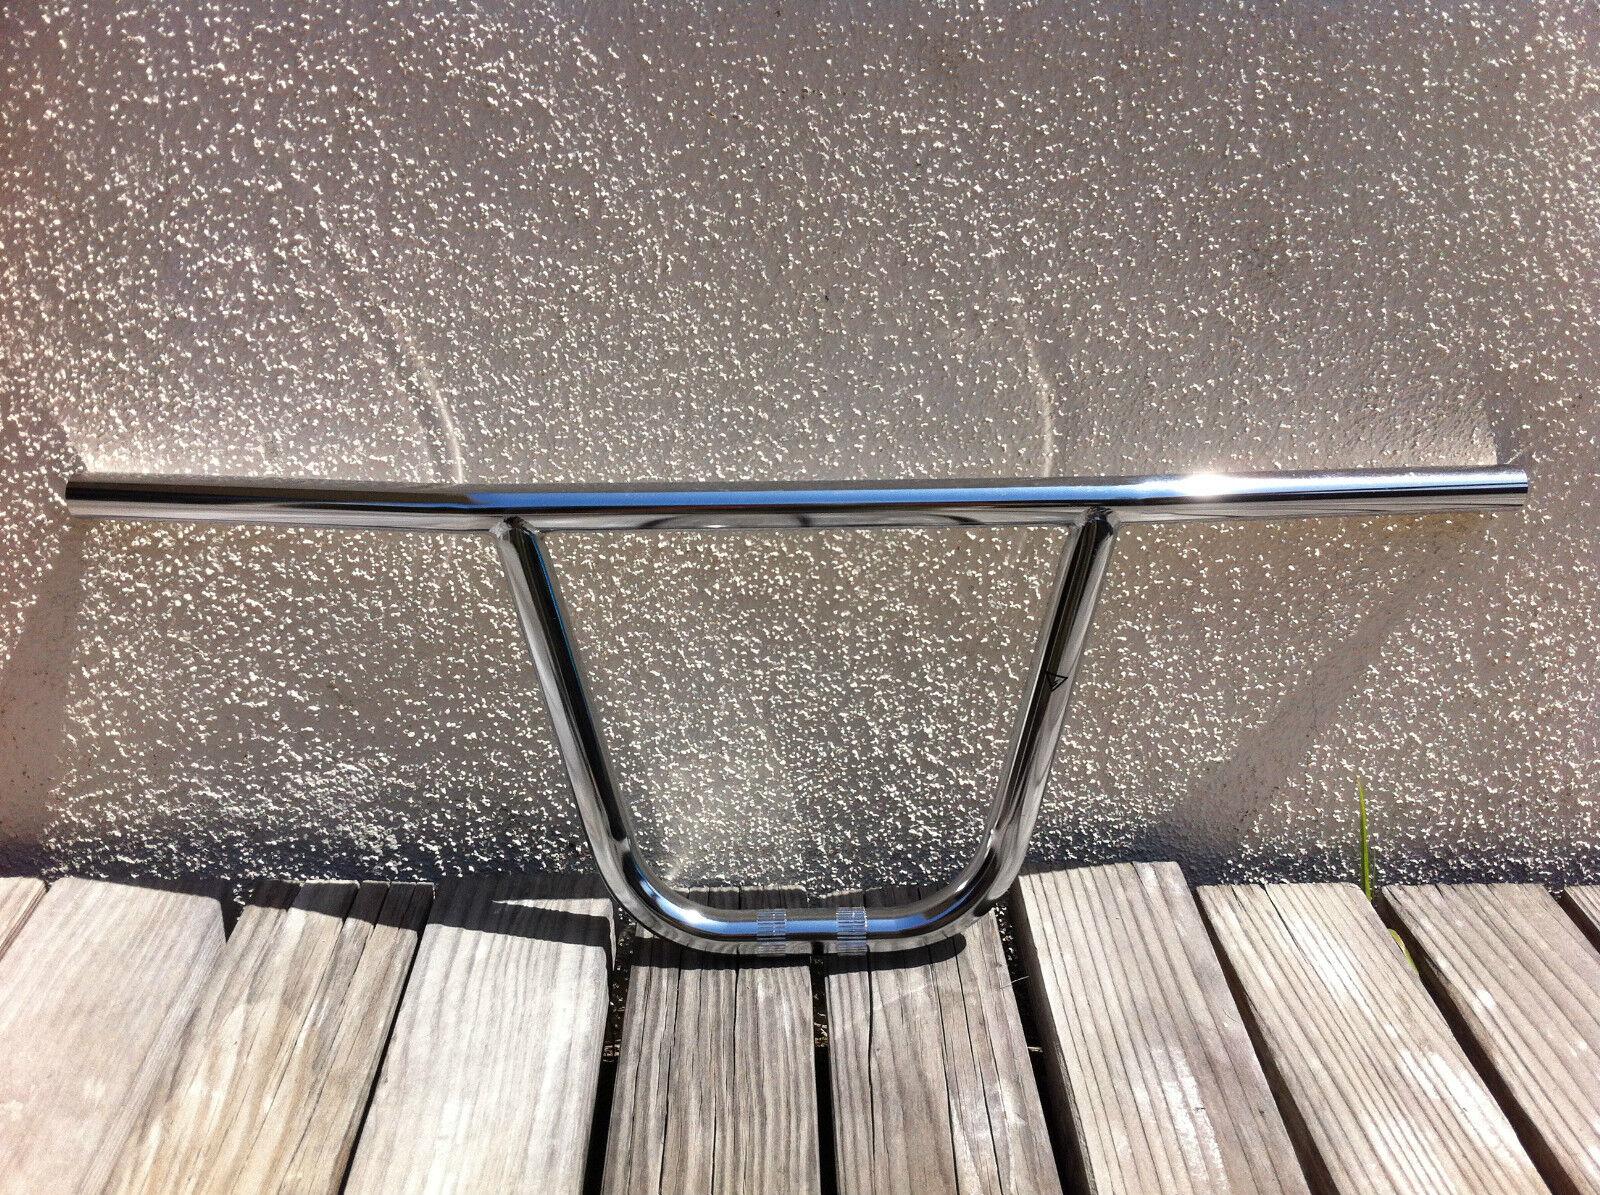 BICYCLE C.W. STYLE HANDLEBAR 22.2MM BMX FIXIE MTB LOWRIDER CRUISER BIKES CYCLING